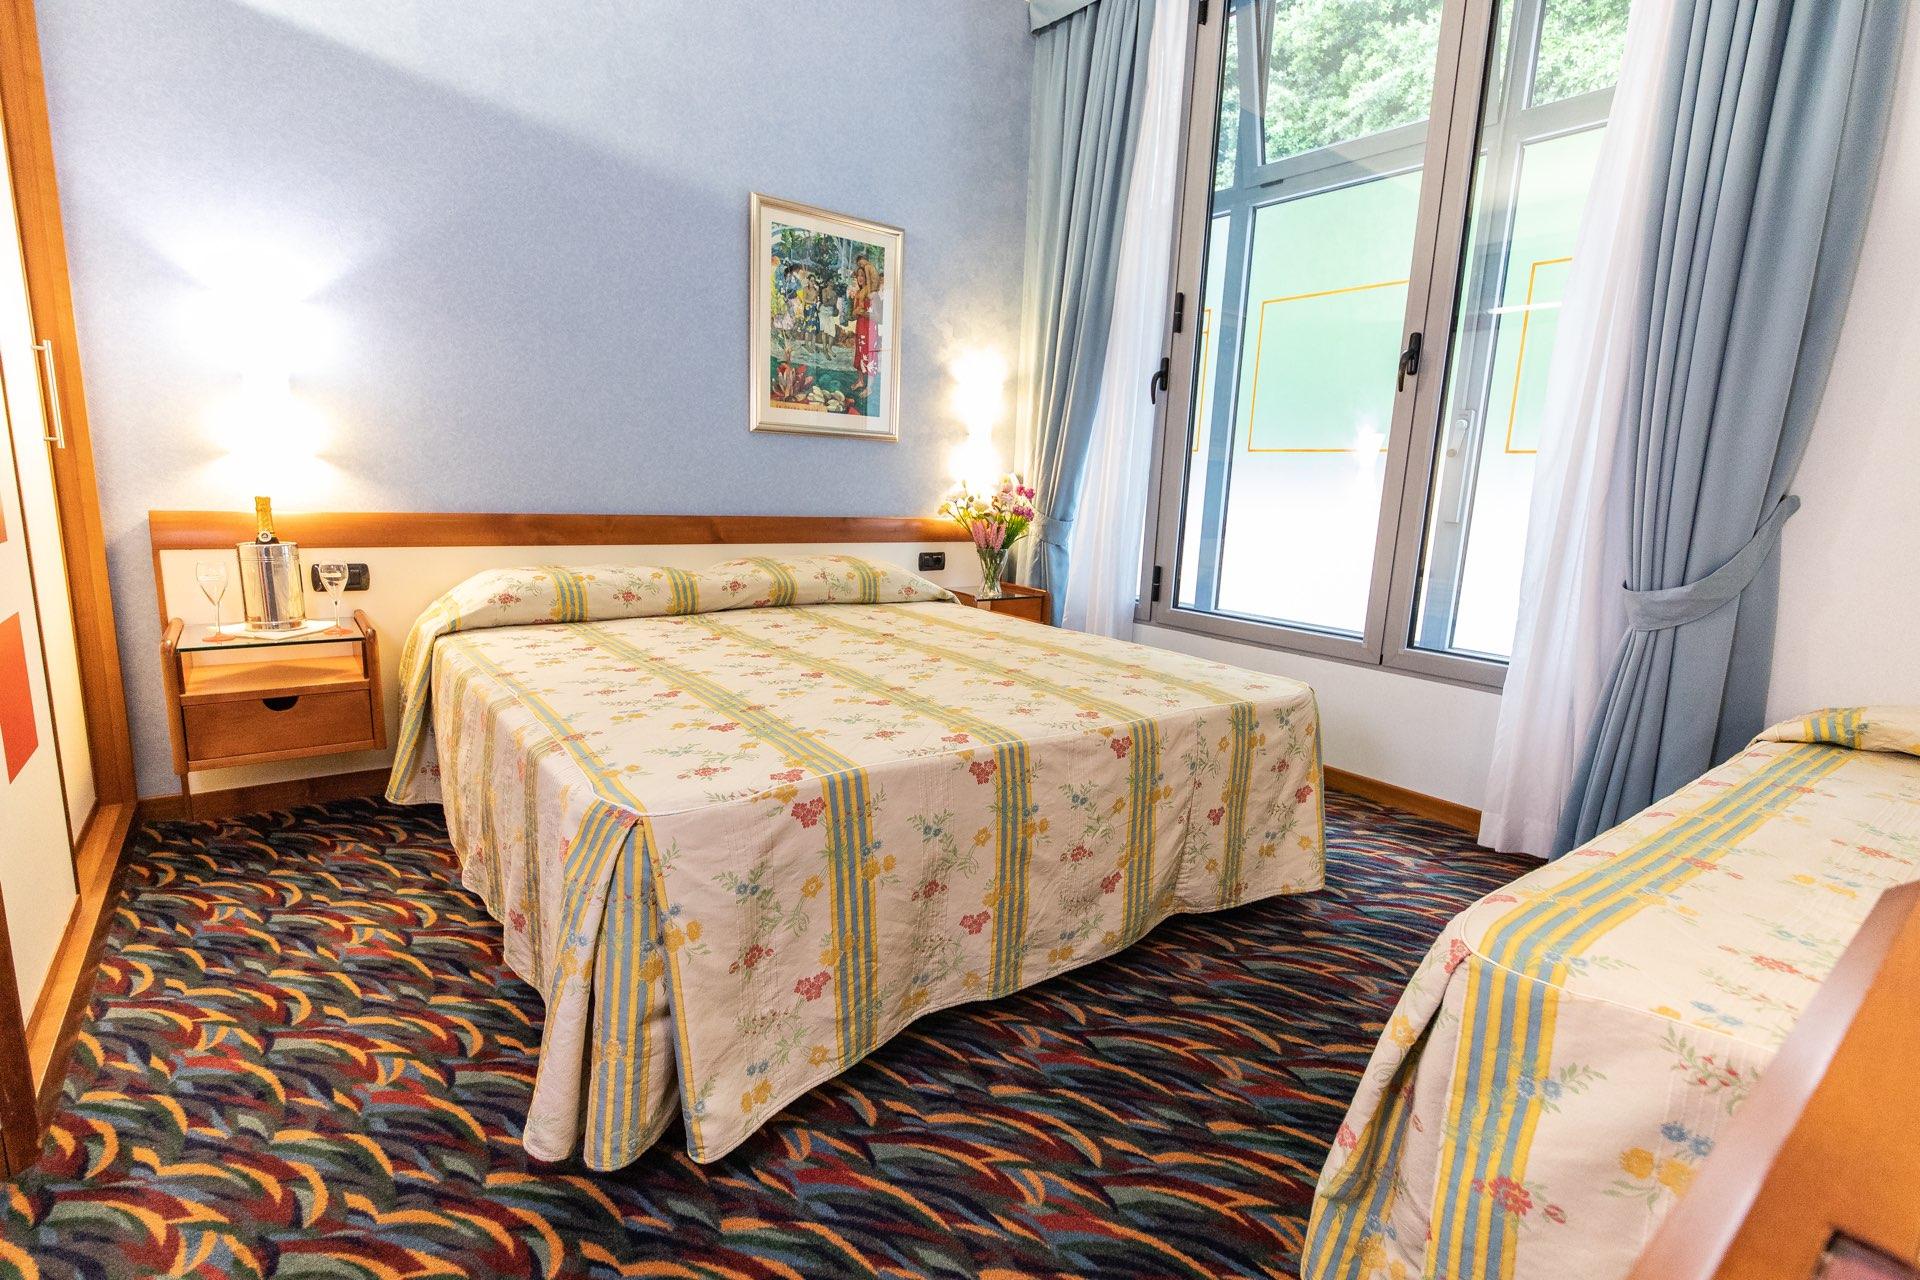 hotel-san-terenzo-camera-standard-tende-aperte